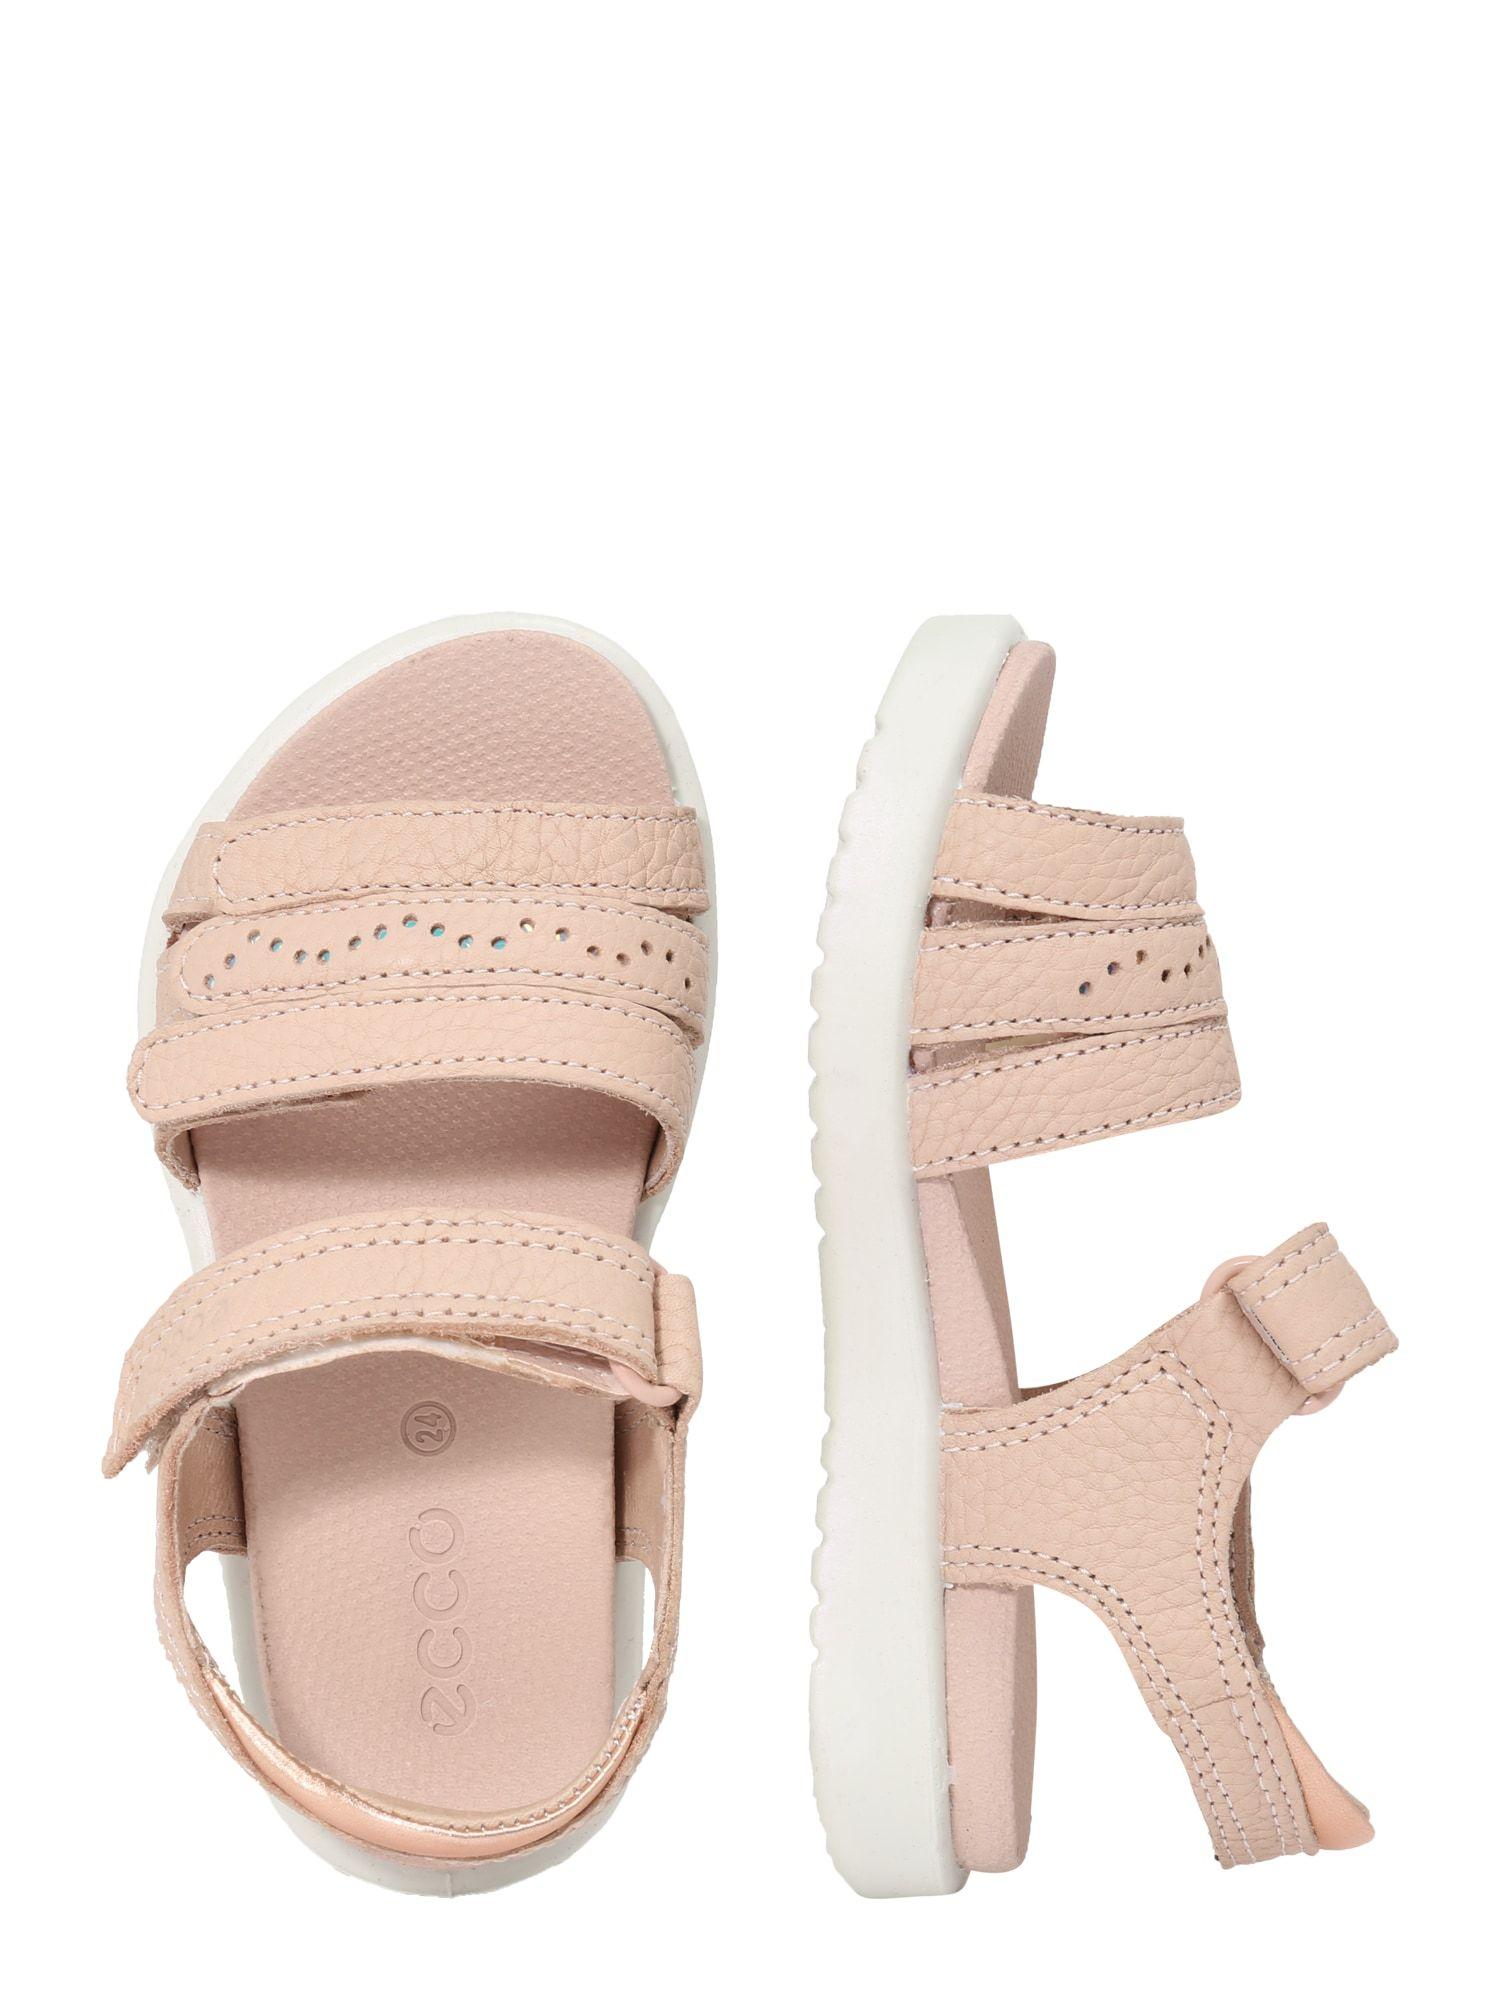 ECCO Sandale 'Flora' Mädchen, Rosa, Größe 31 | Ecco sandalen